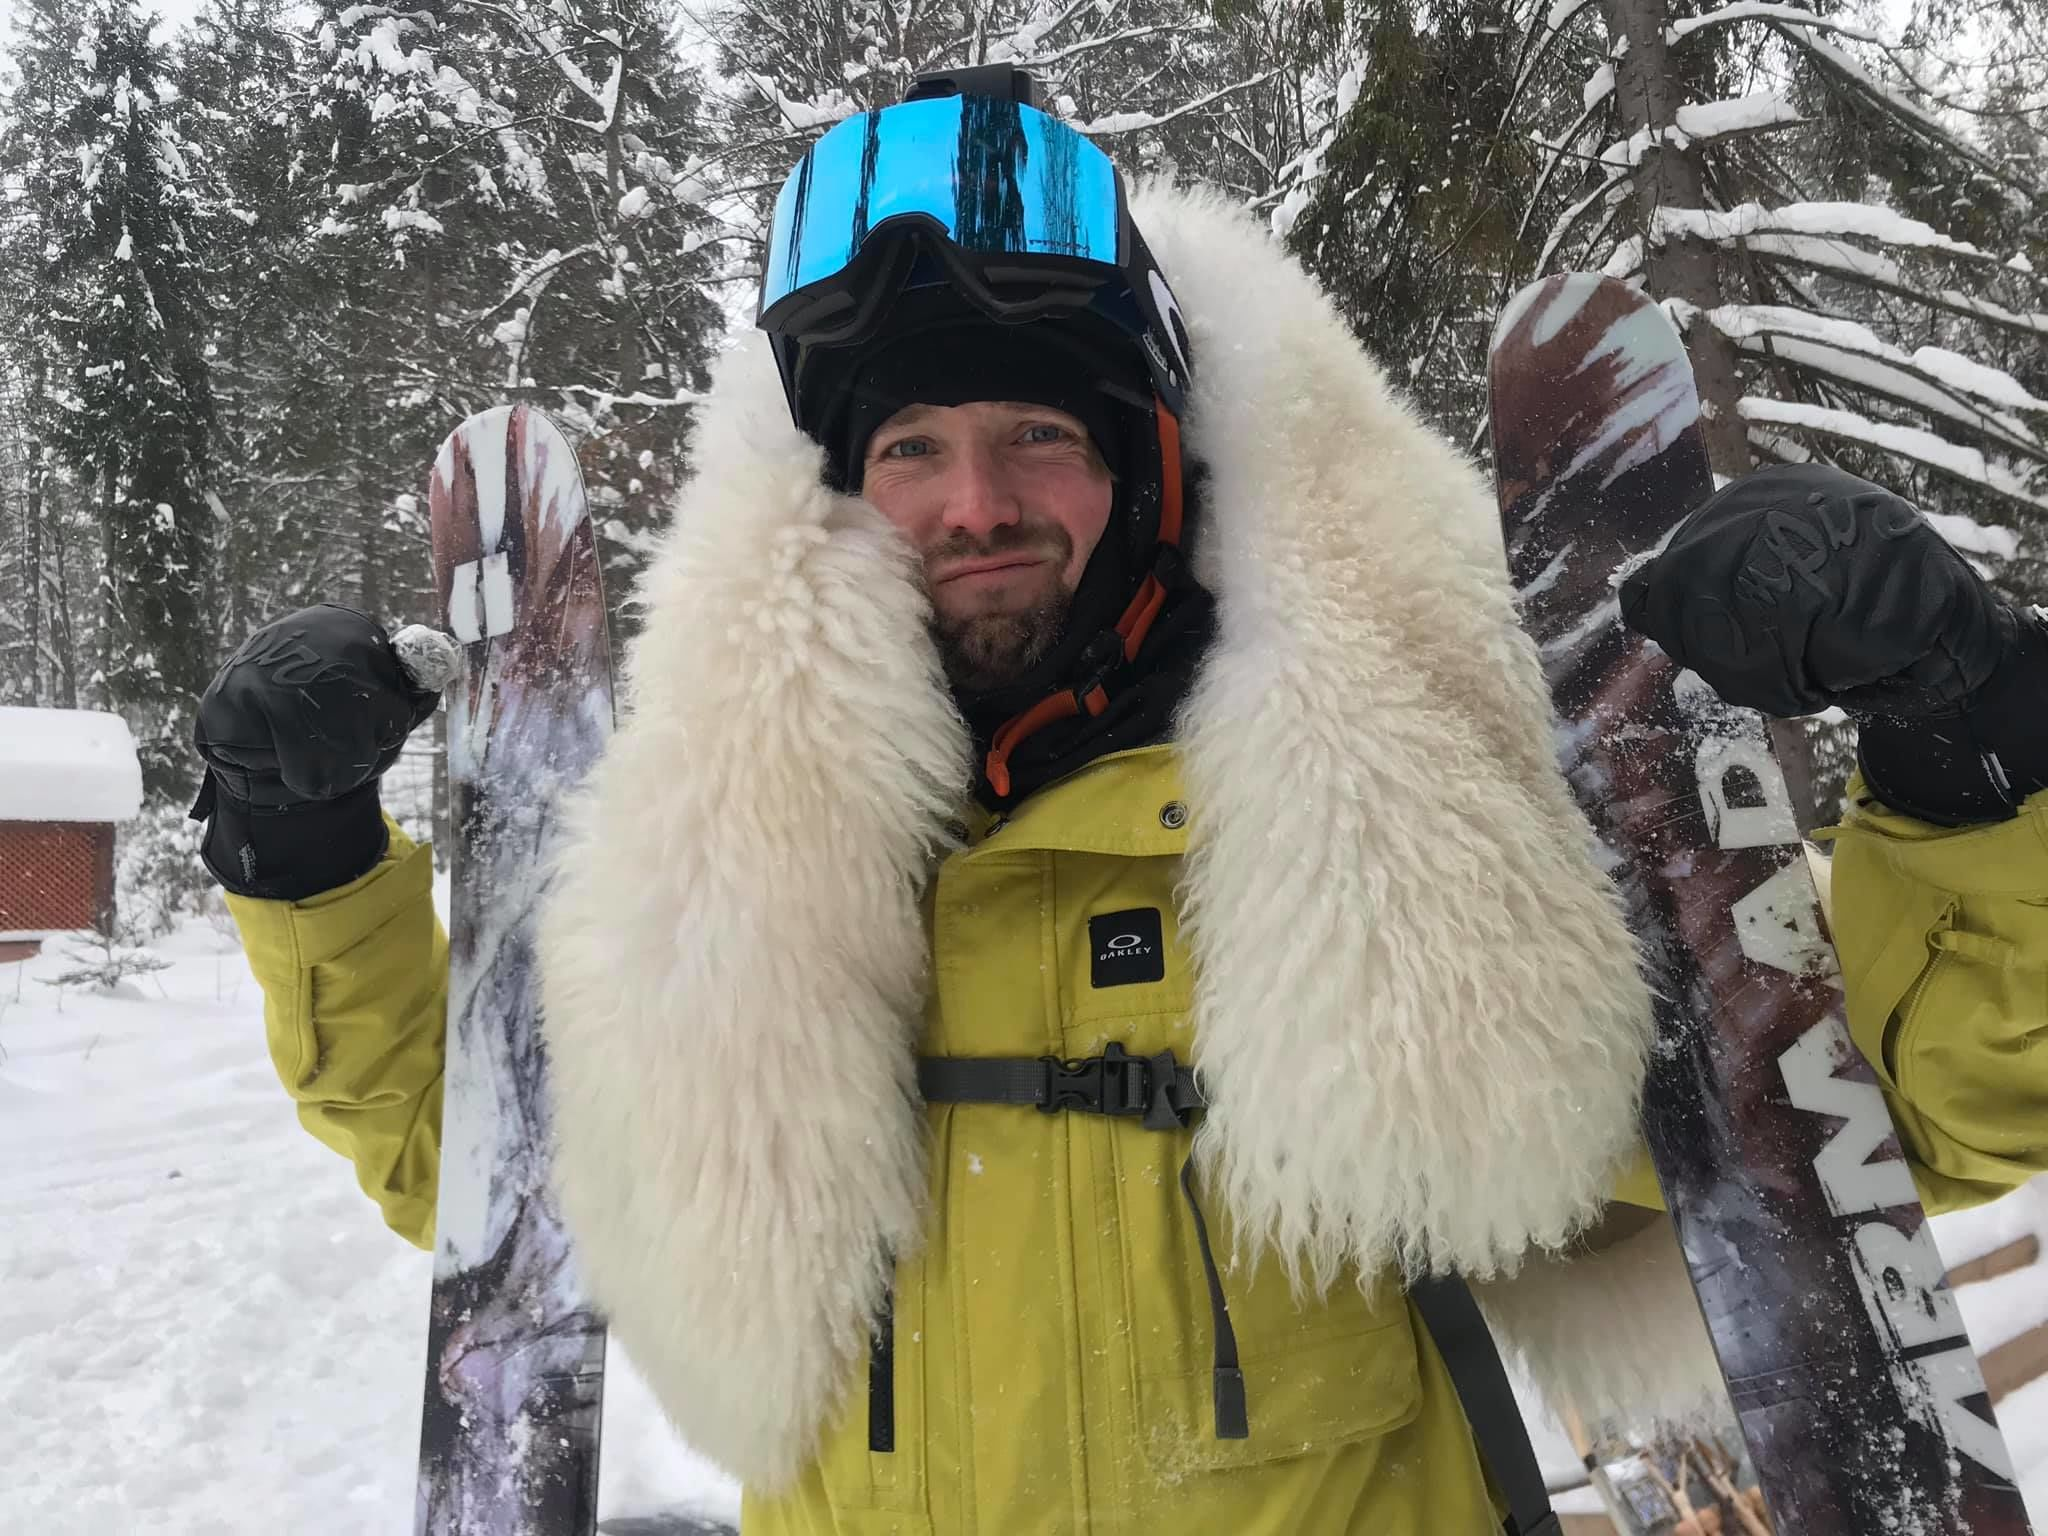 лижник Ігор Грищенко